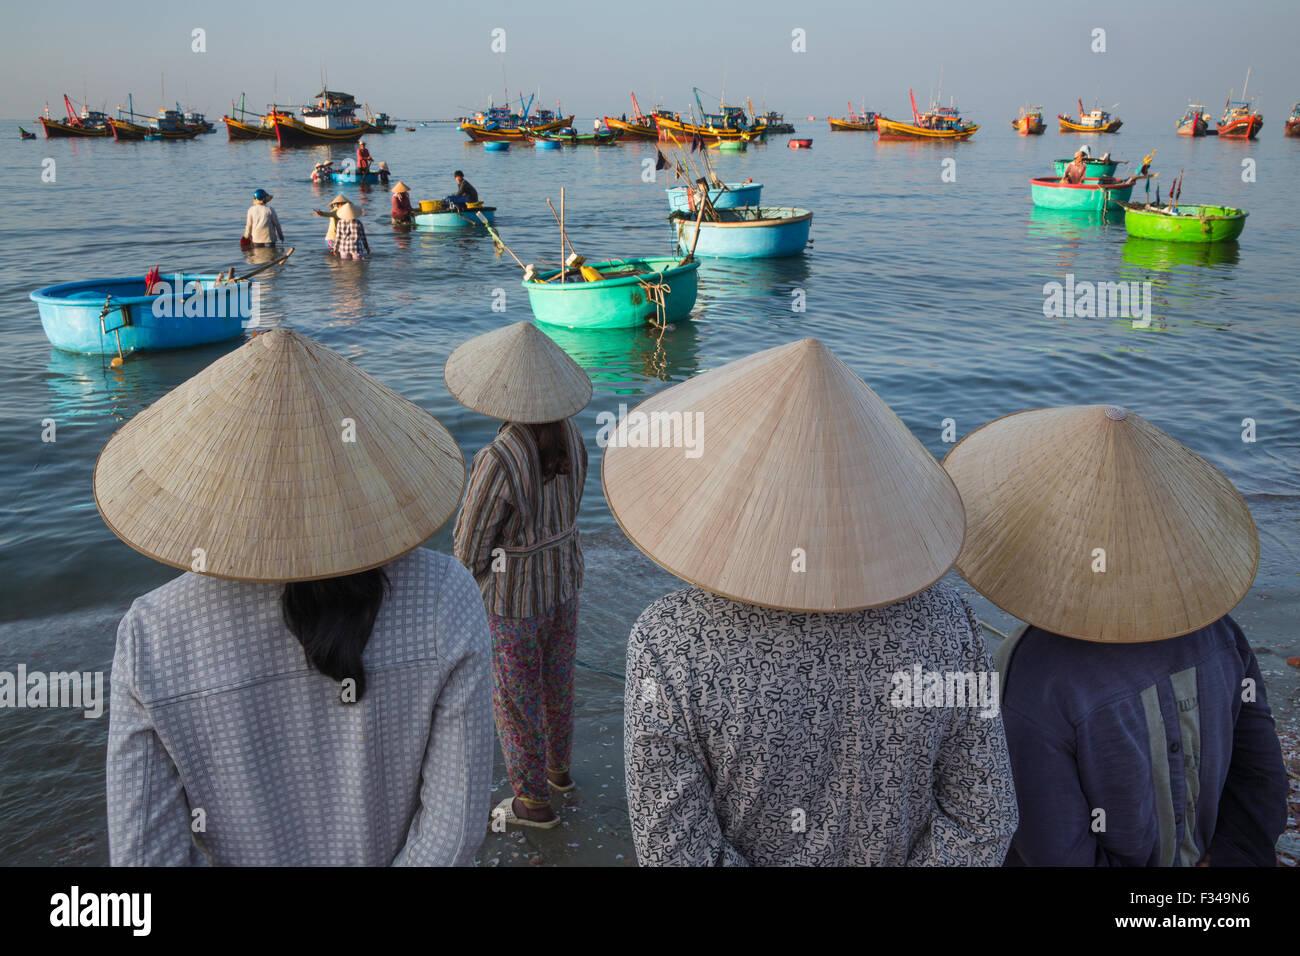 ladies awaiting the landing of the catch, Mui Ne fishing village, Bình Thuận Province, Vietnam - Stock Image